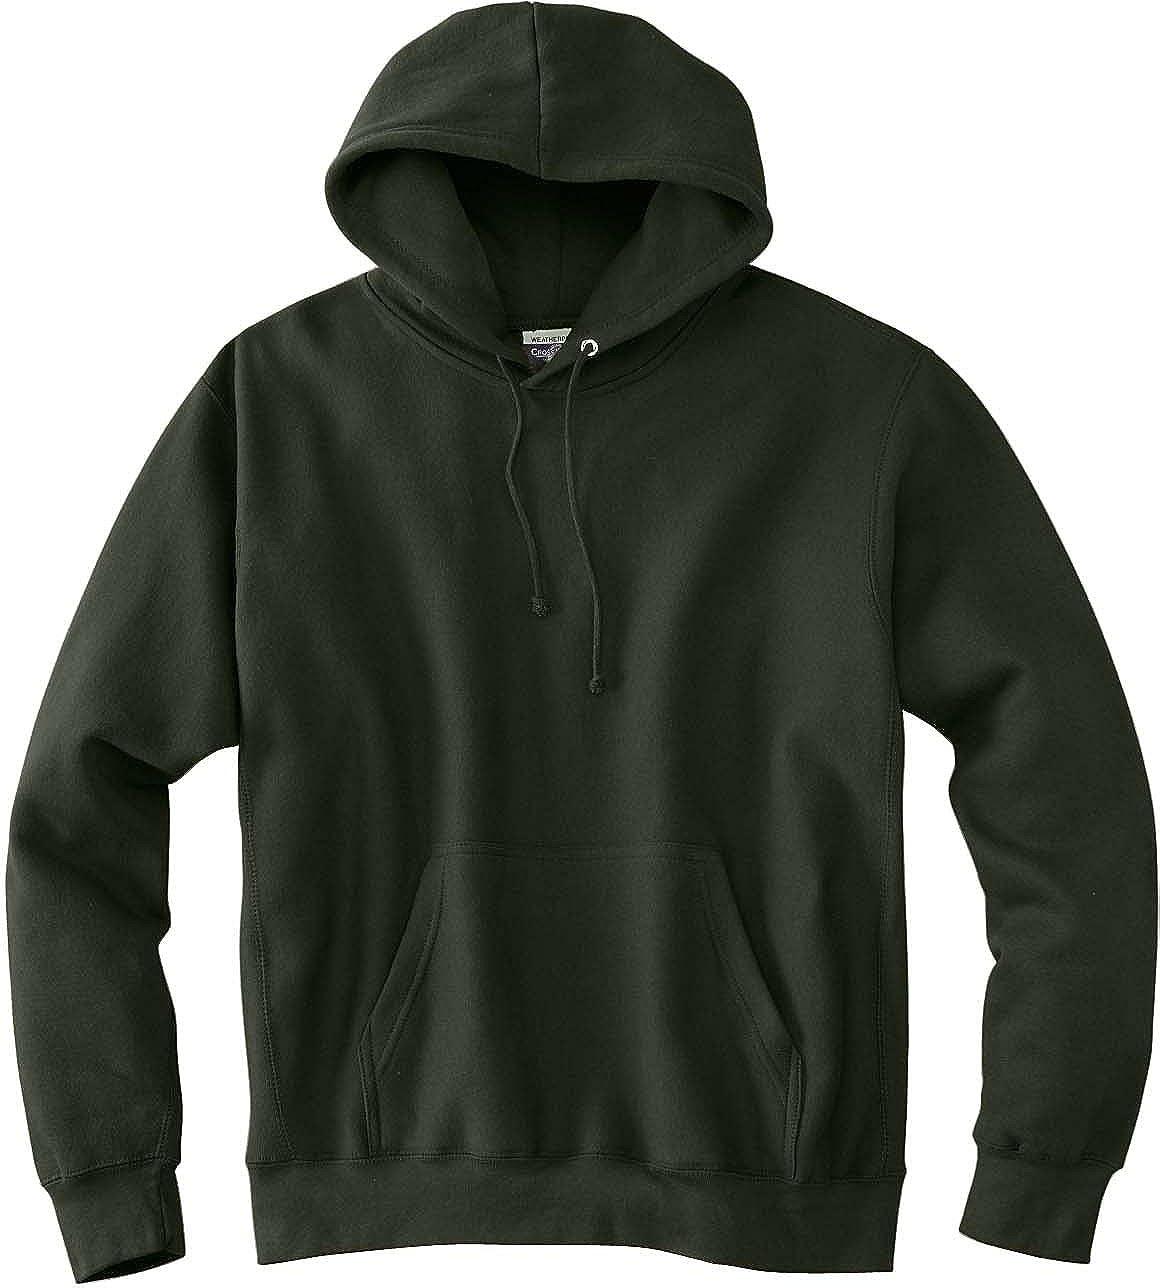 7700 Weatherproof Cross Weave Hooded Sweatshirt